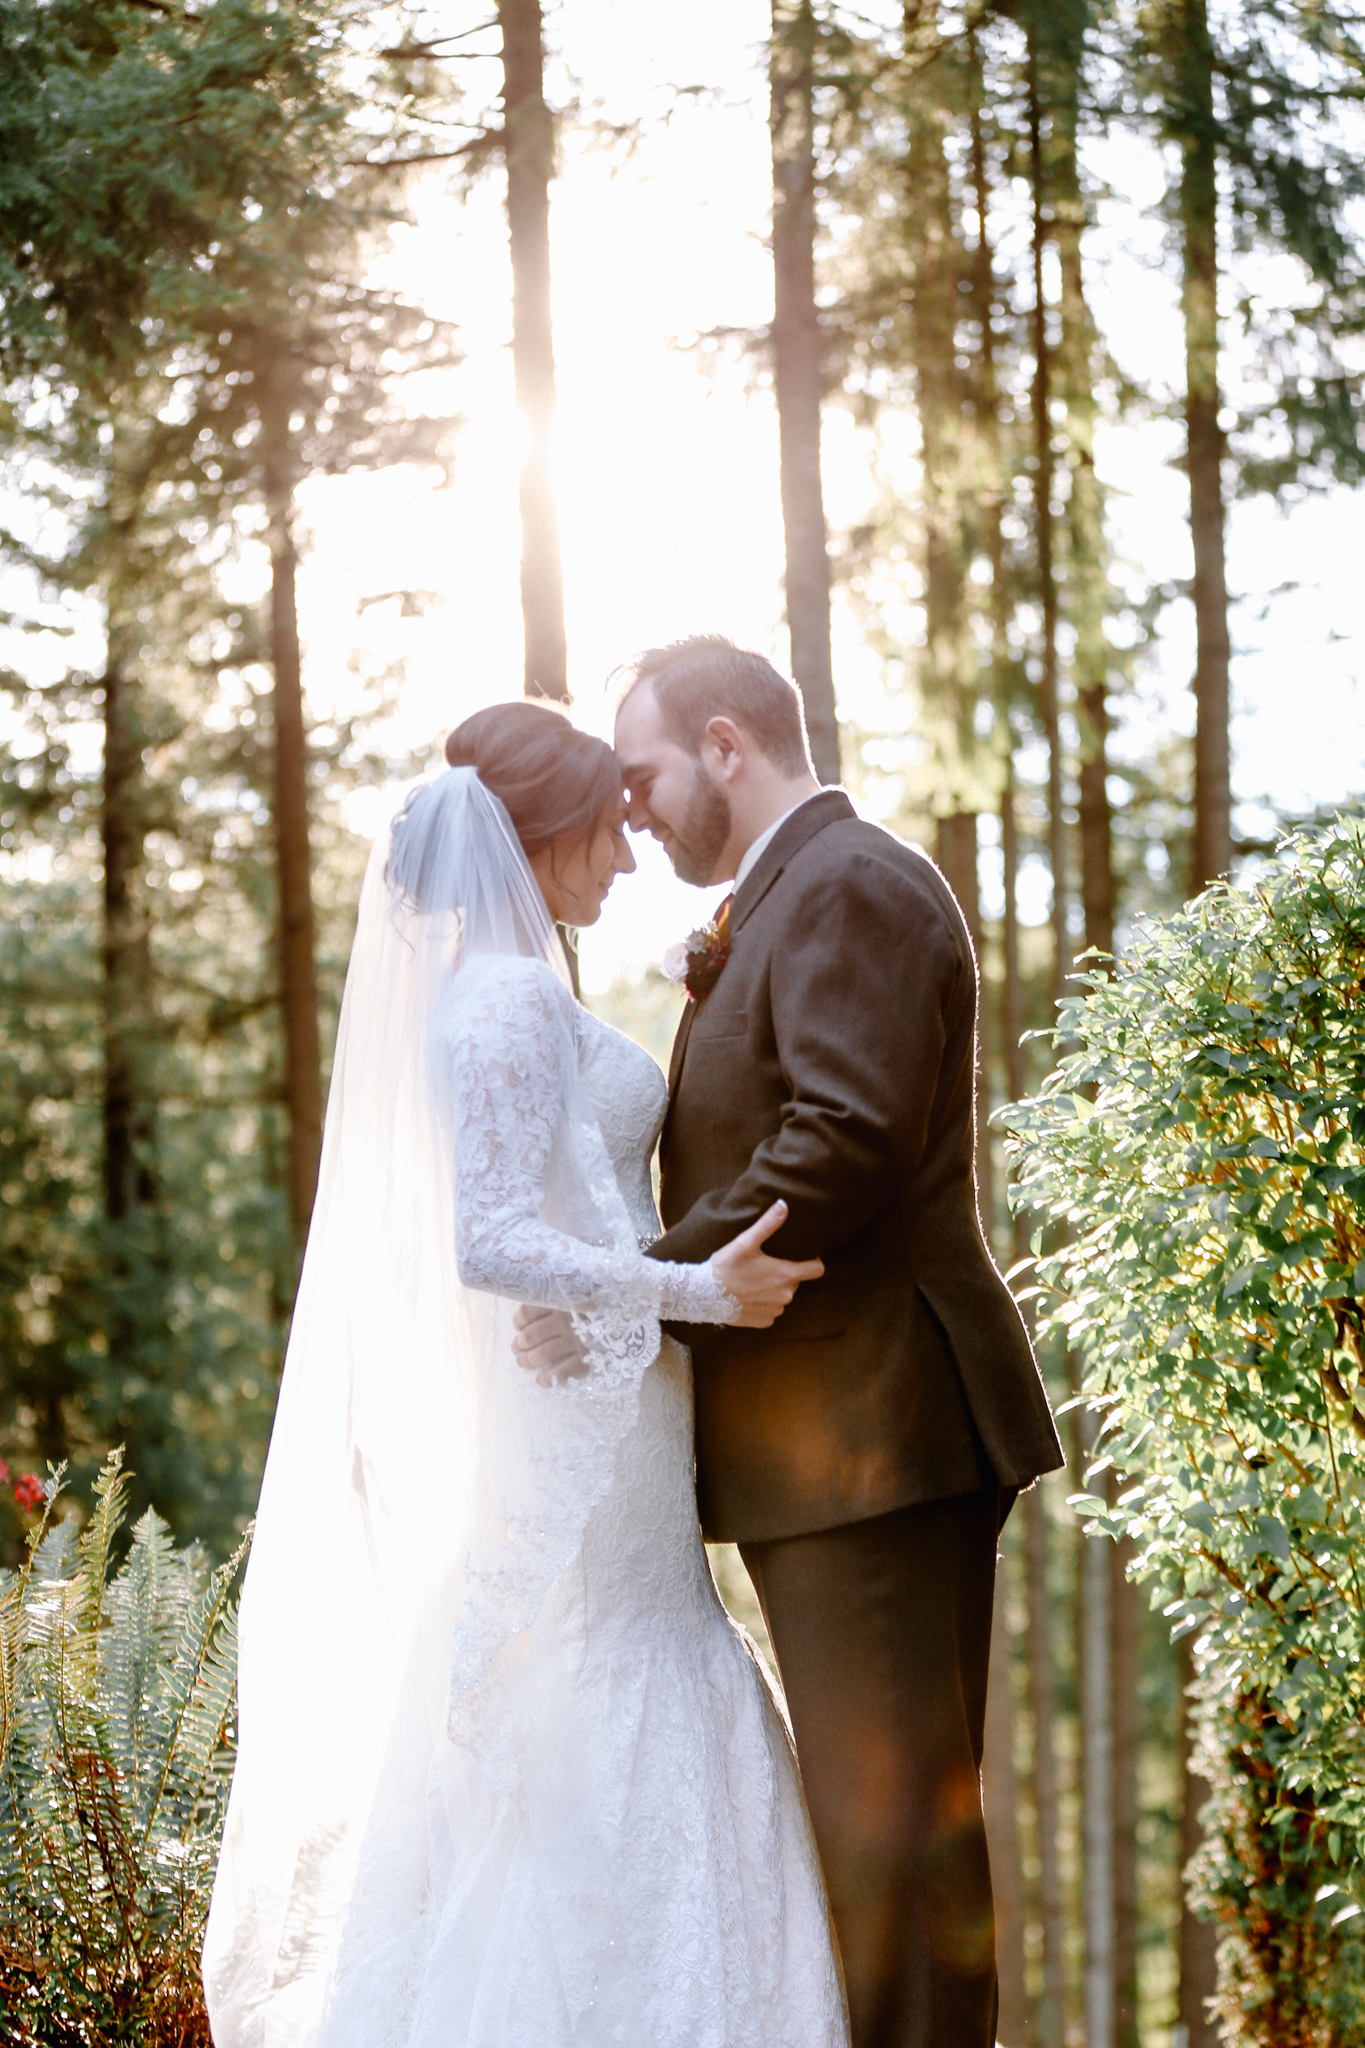 Manu and Laura - Portland Wedding Photographer - 24.jpg